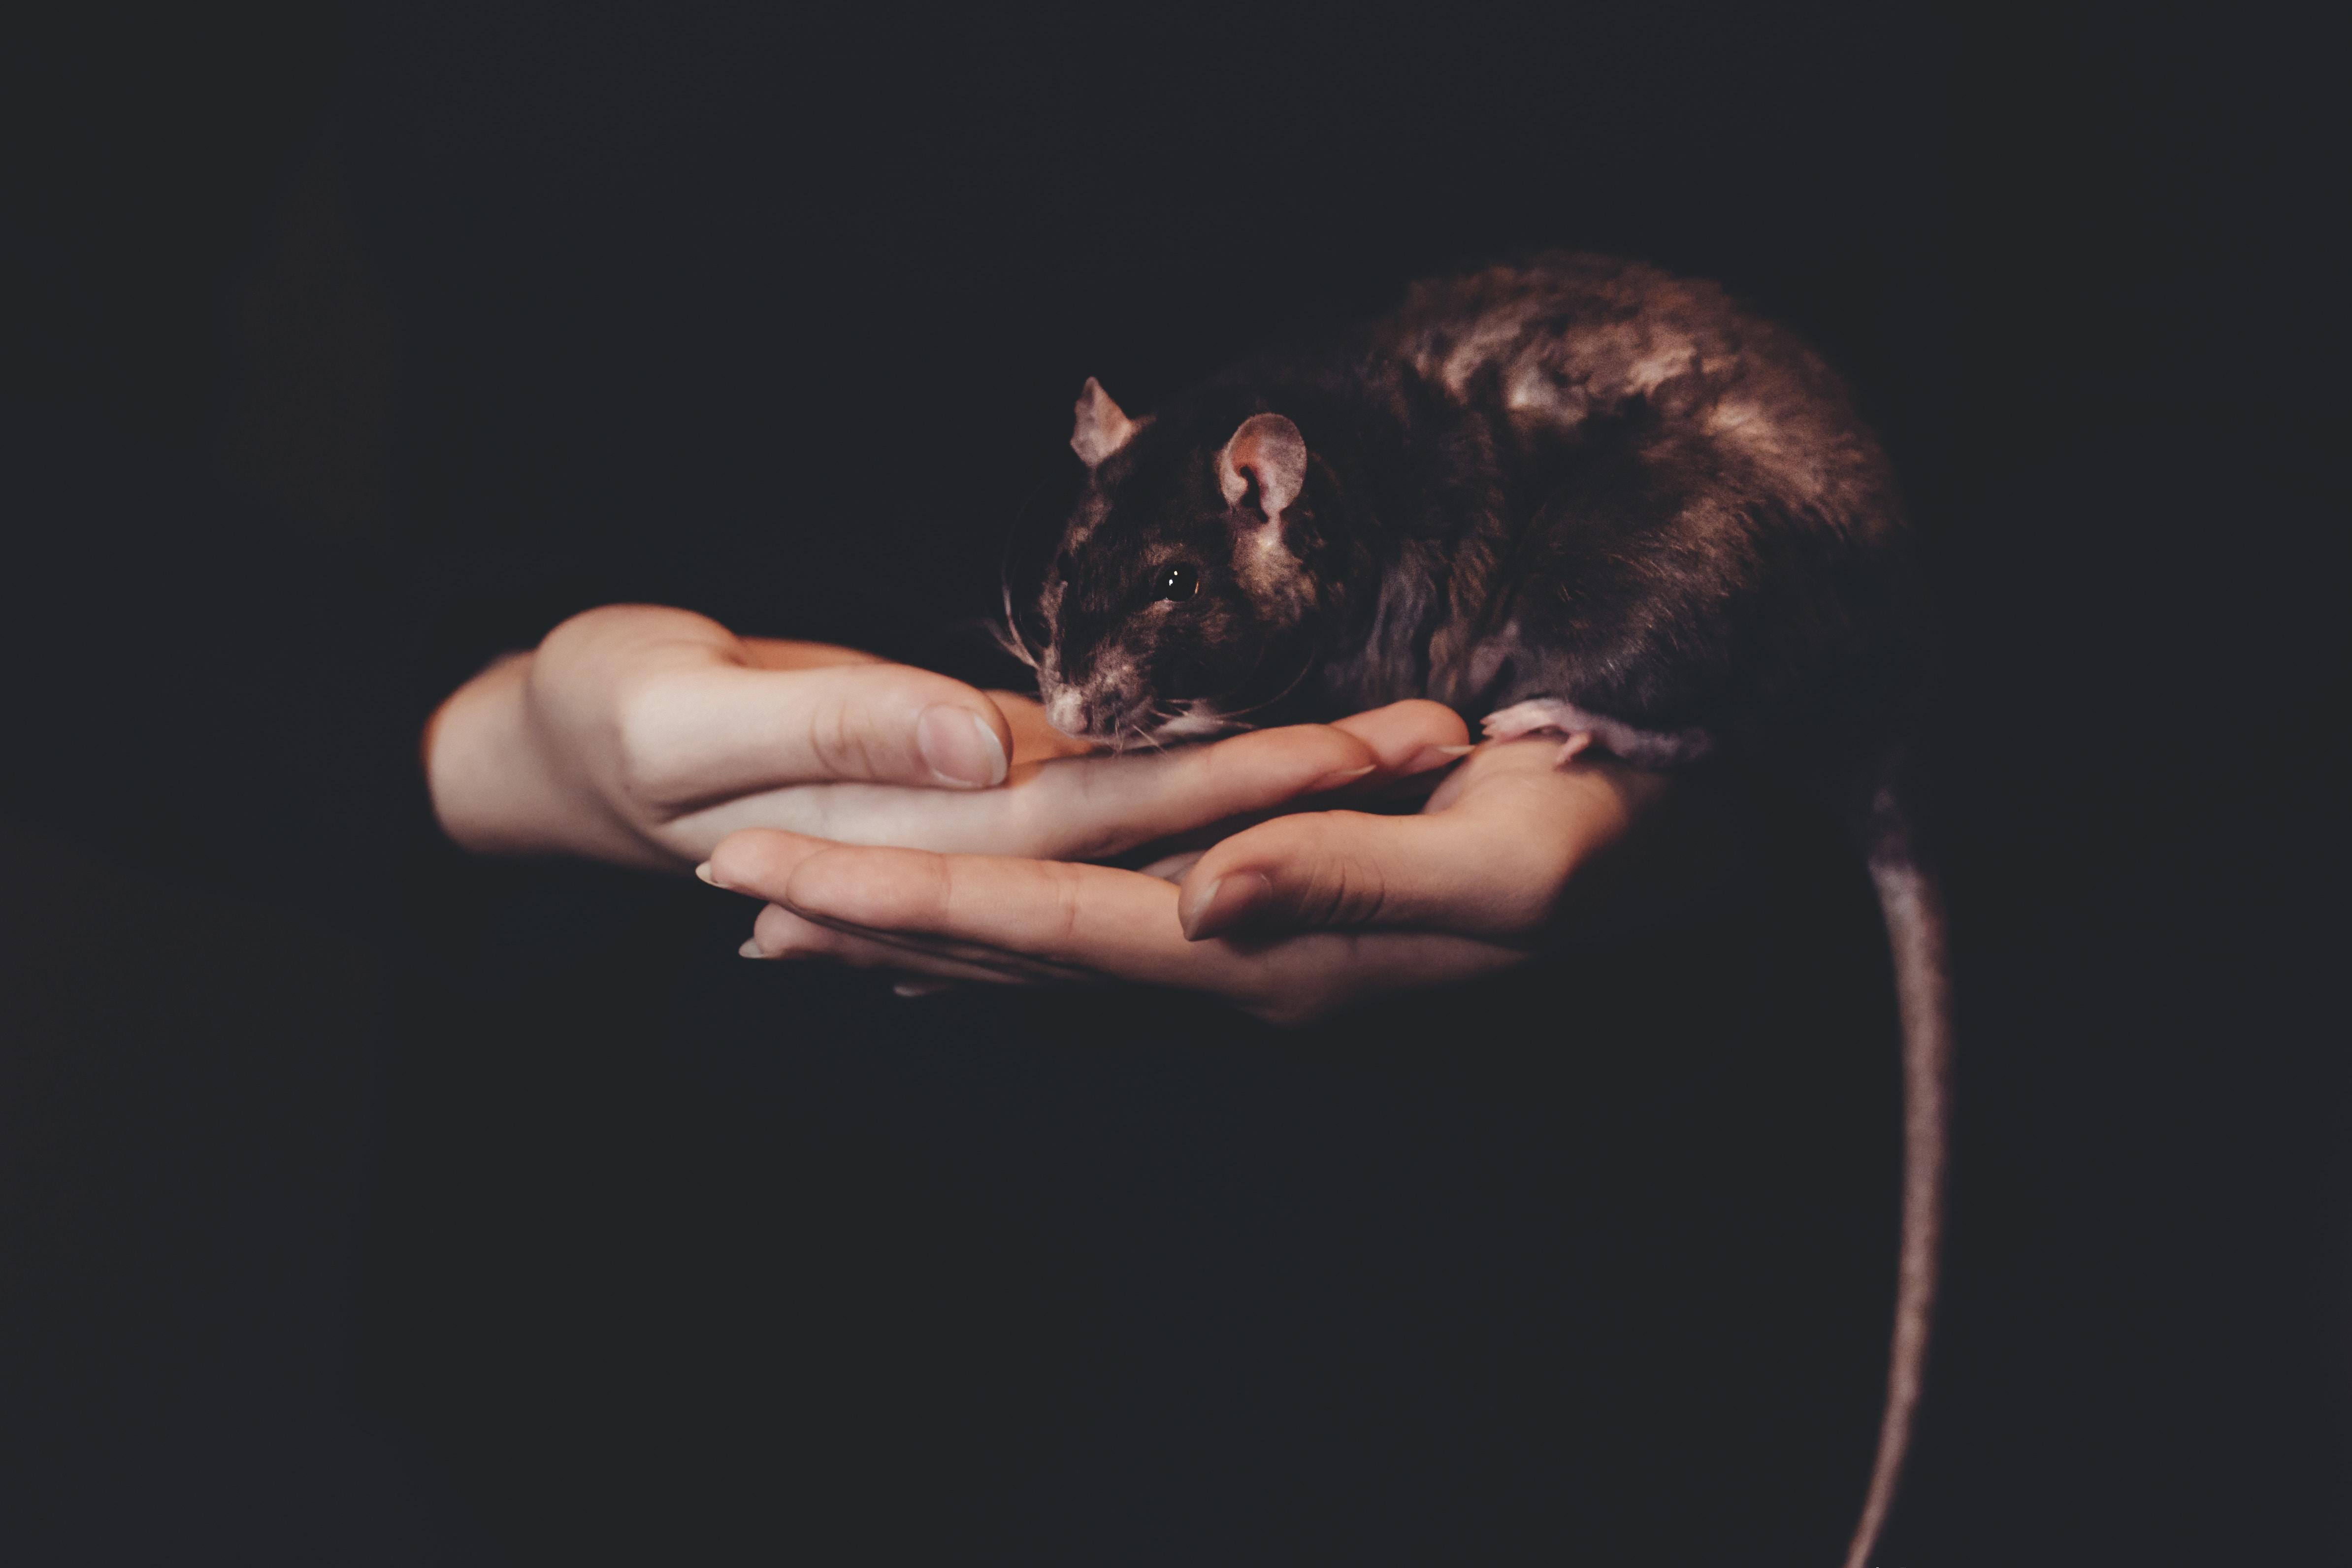 person holding black rat